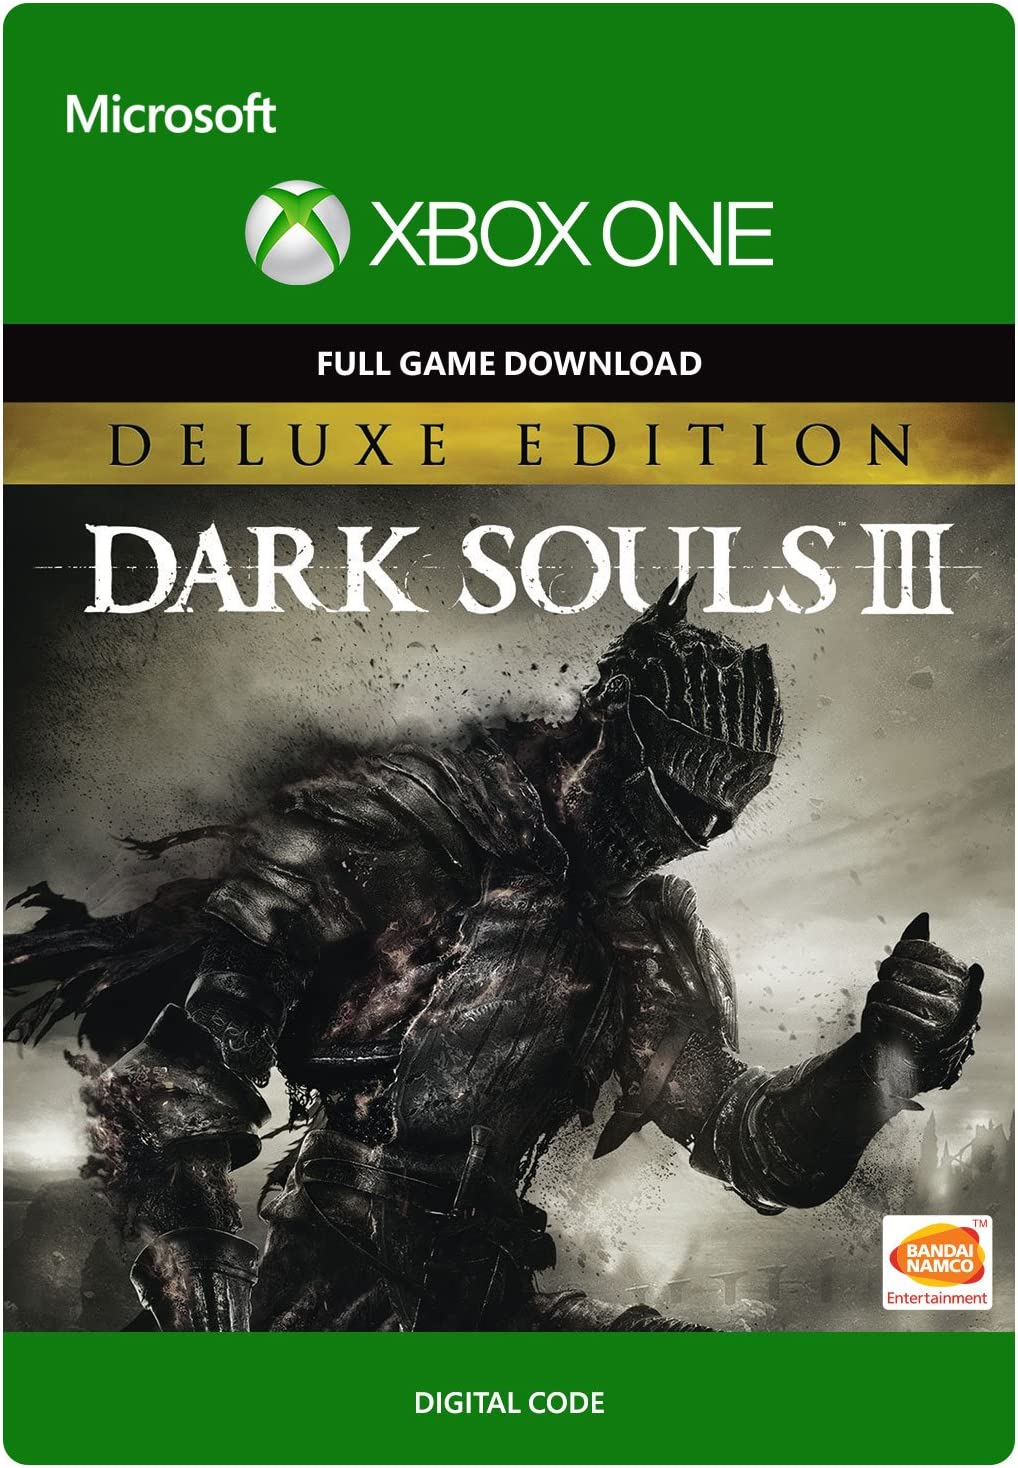 Amazon.com: Dark Souls III Season Pass - Xbox One Digital Code: Video Games